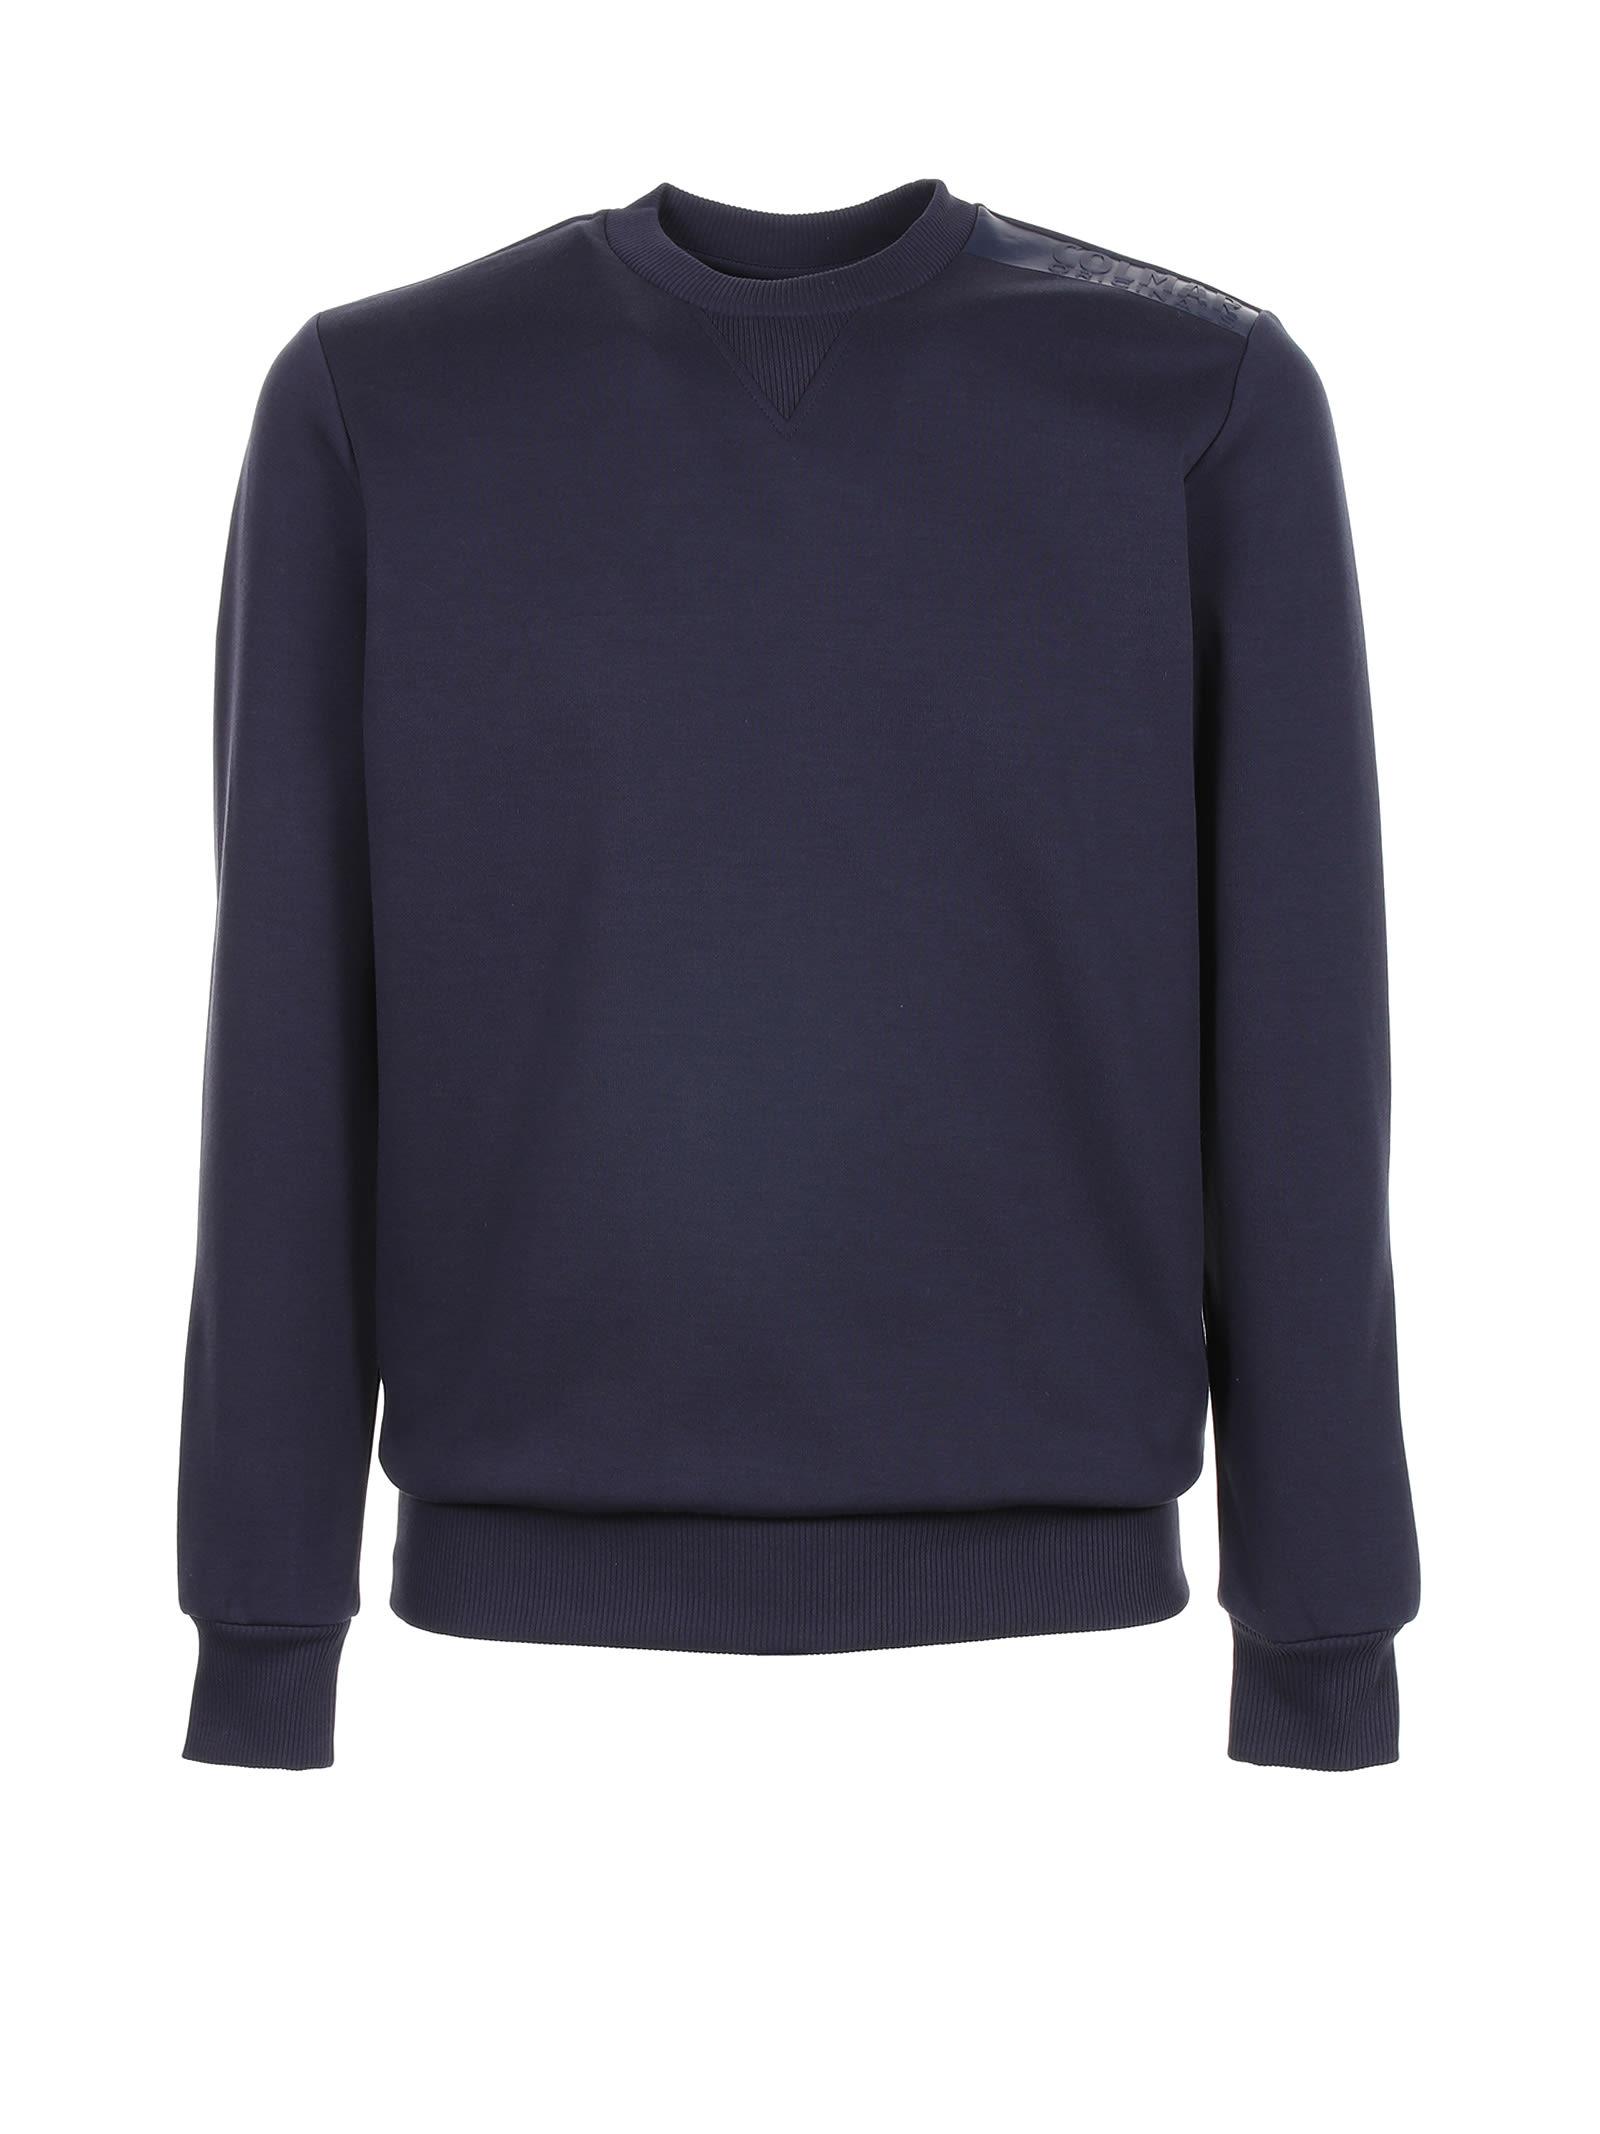 Colmar Sweatshirts SWEATSHIRT IN BLUE COTTON